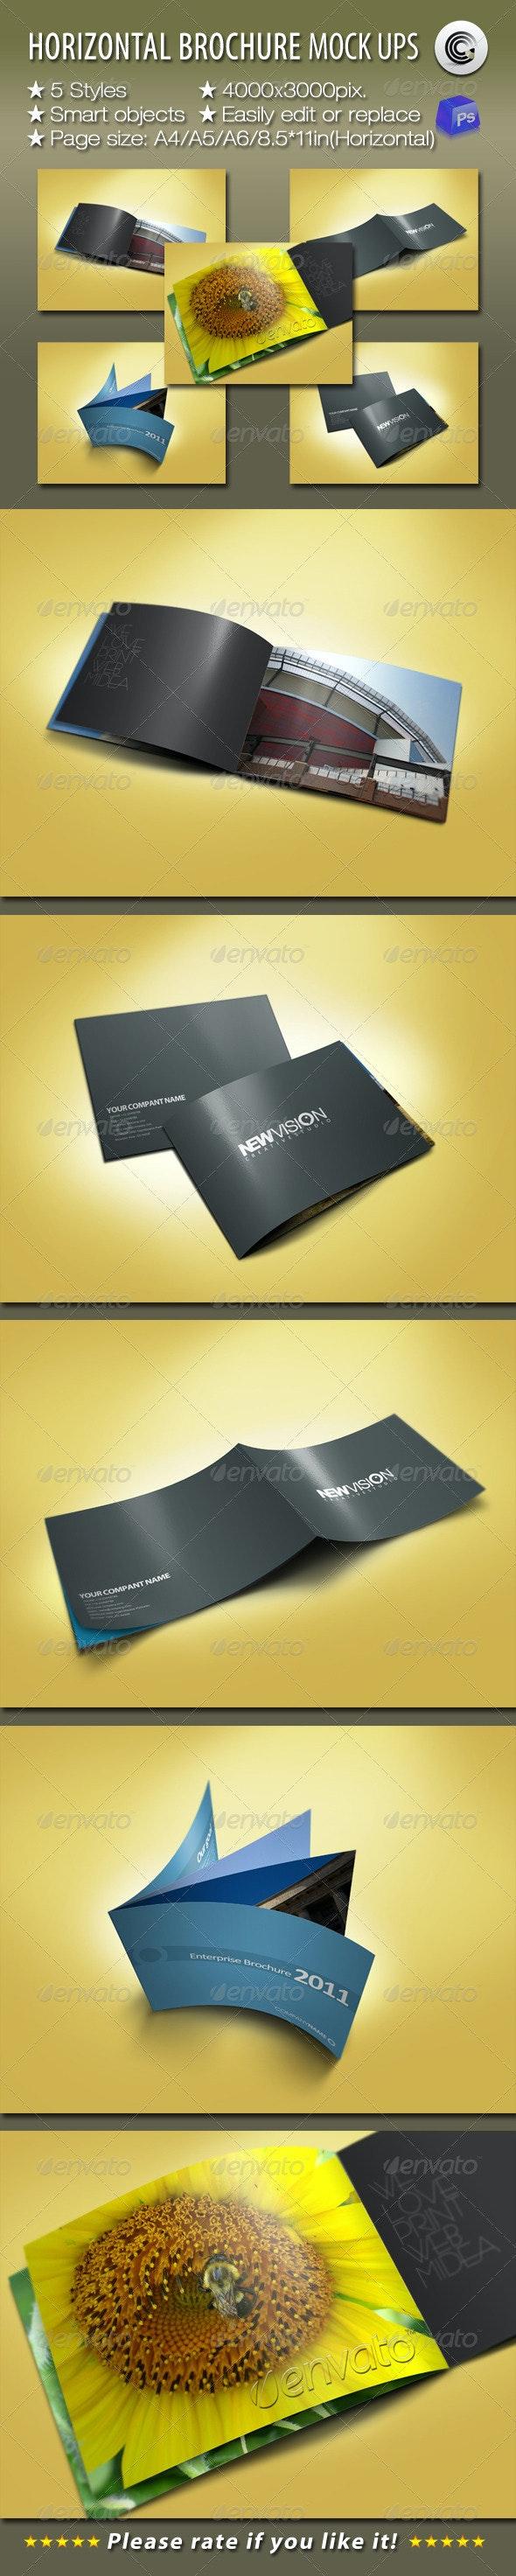 Horizontal Brochures Preview Mock-ups - Brochures Print